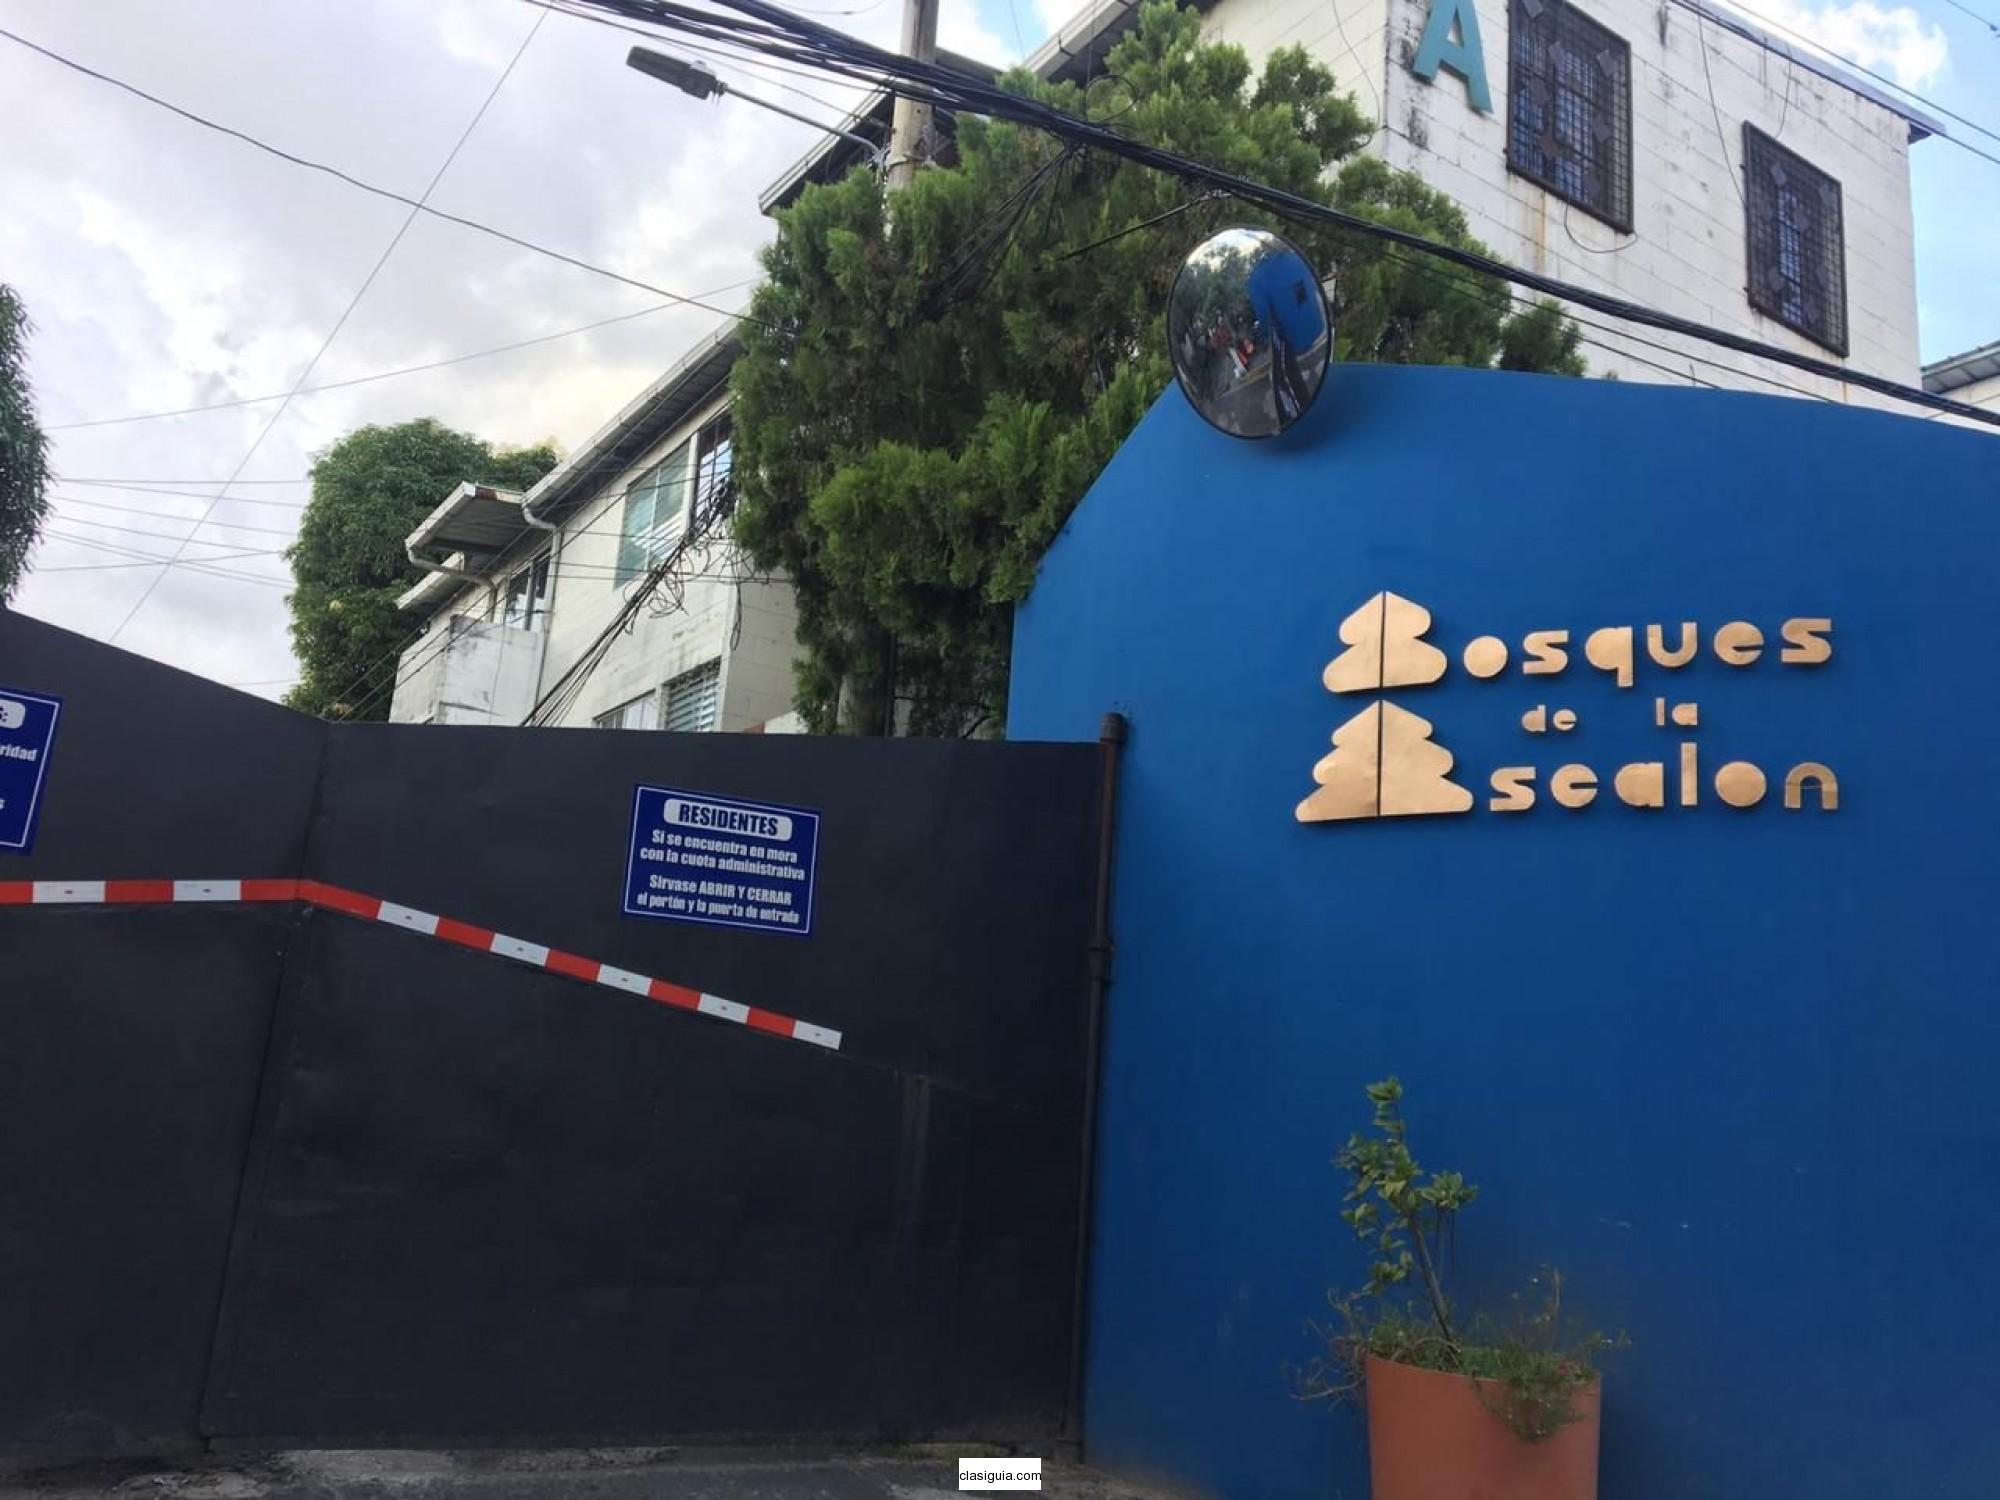 2 APARTAMENTOS  BOSQUES DE LA ESCALON